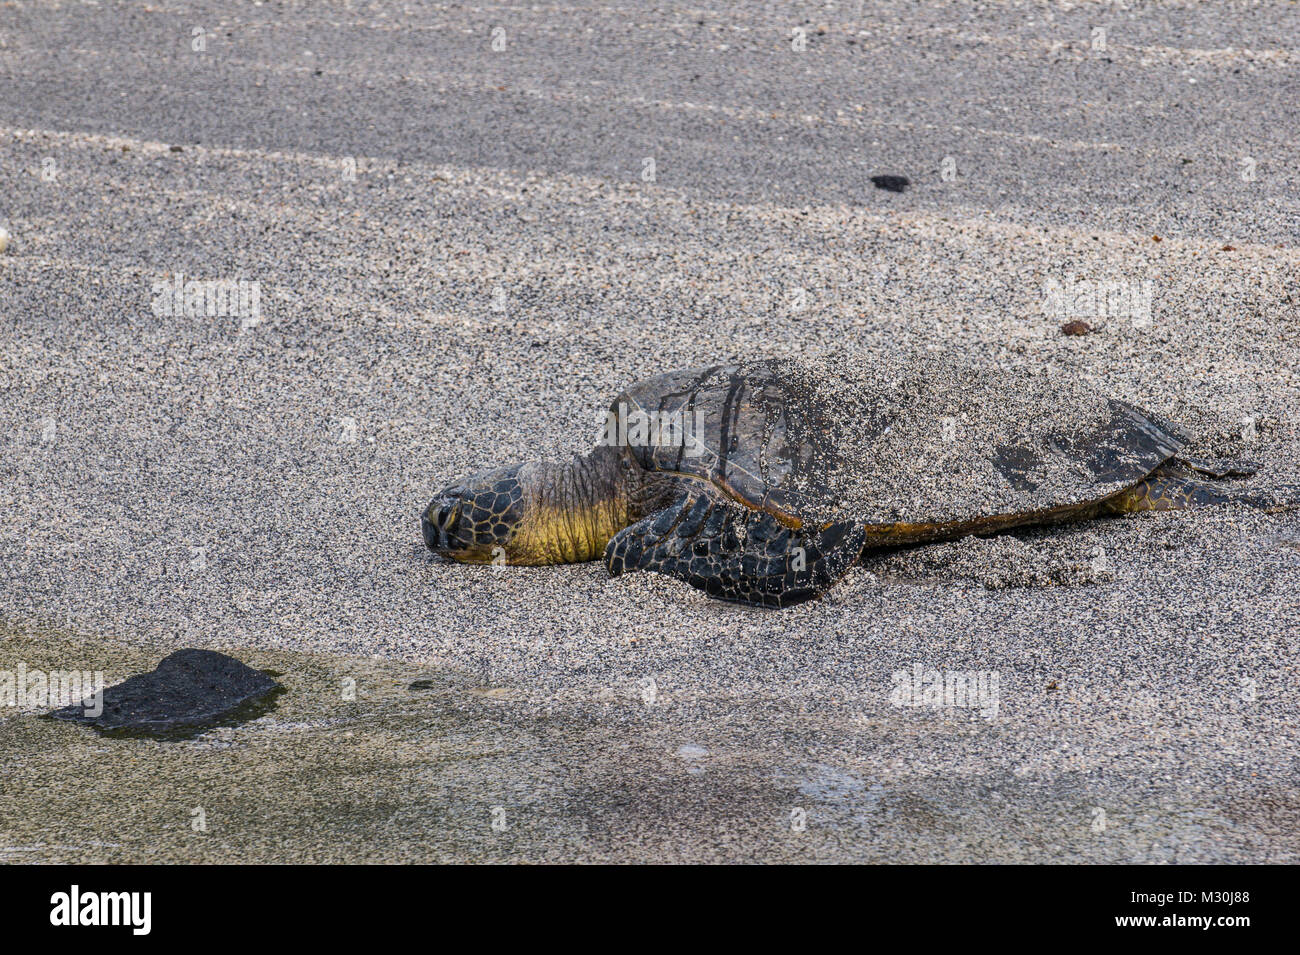 Sea turtle  (Chelonioidea), Puuhonua o Honaunau National Historical Park , Big Island, Hawaii - Stock Image